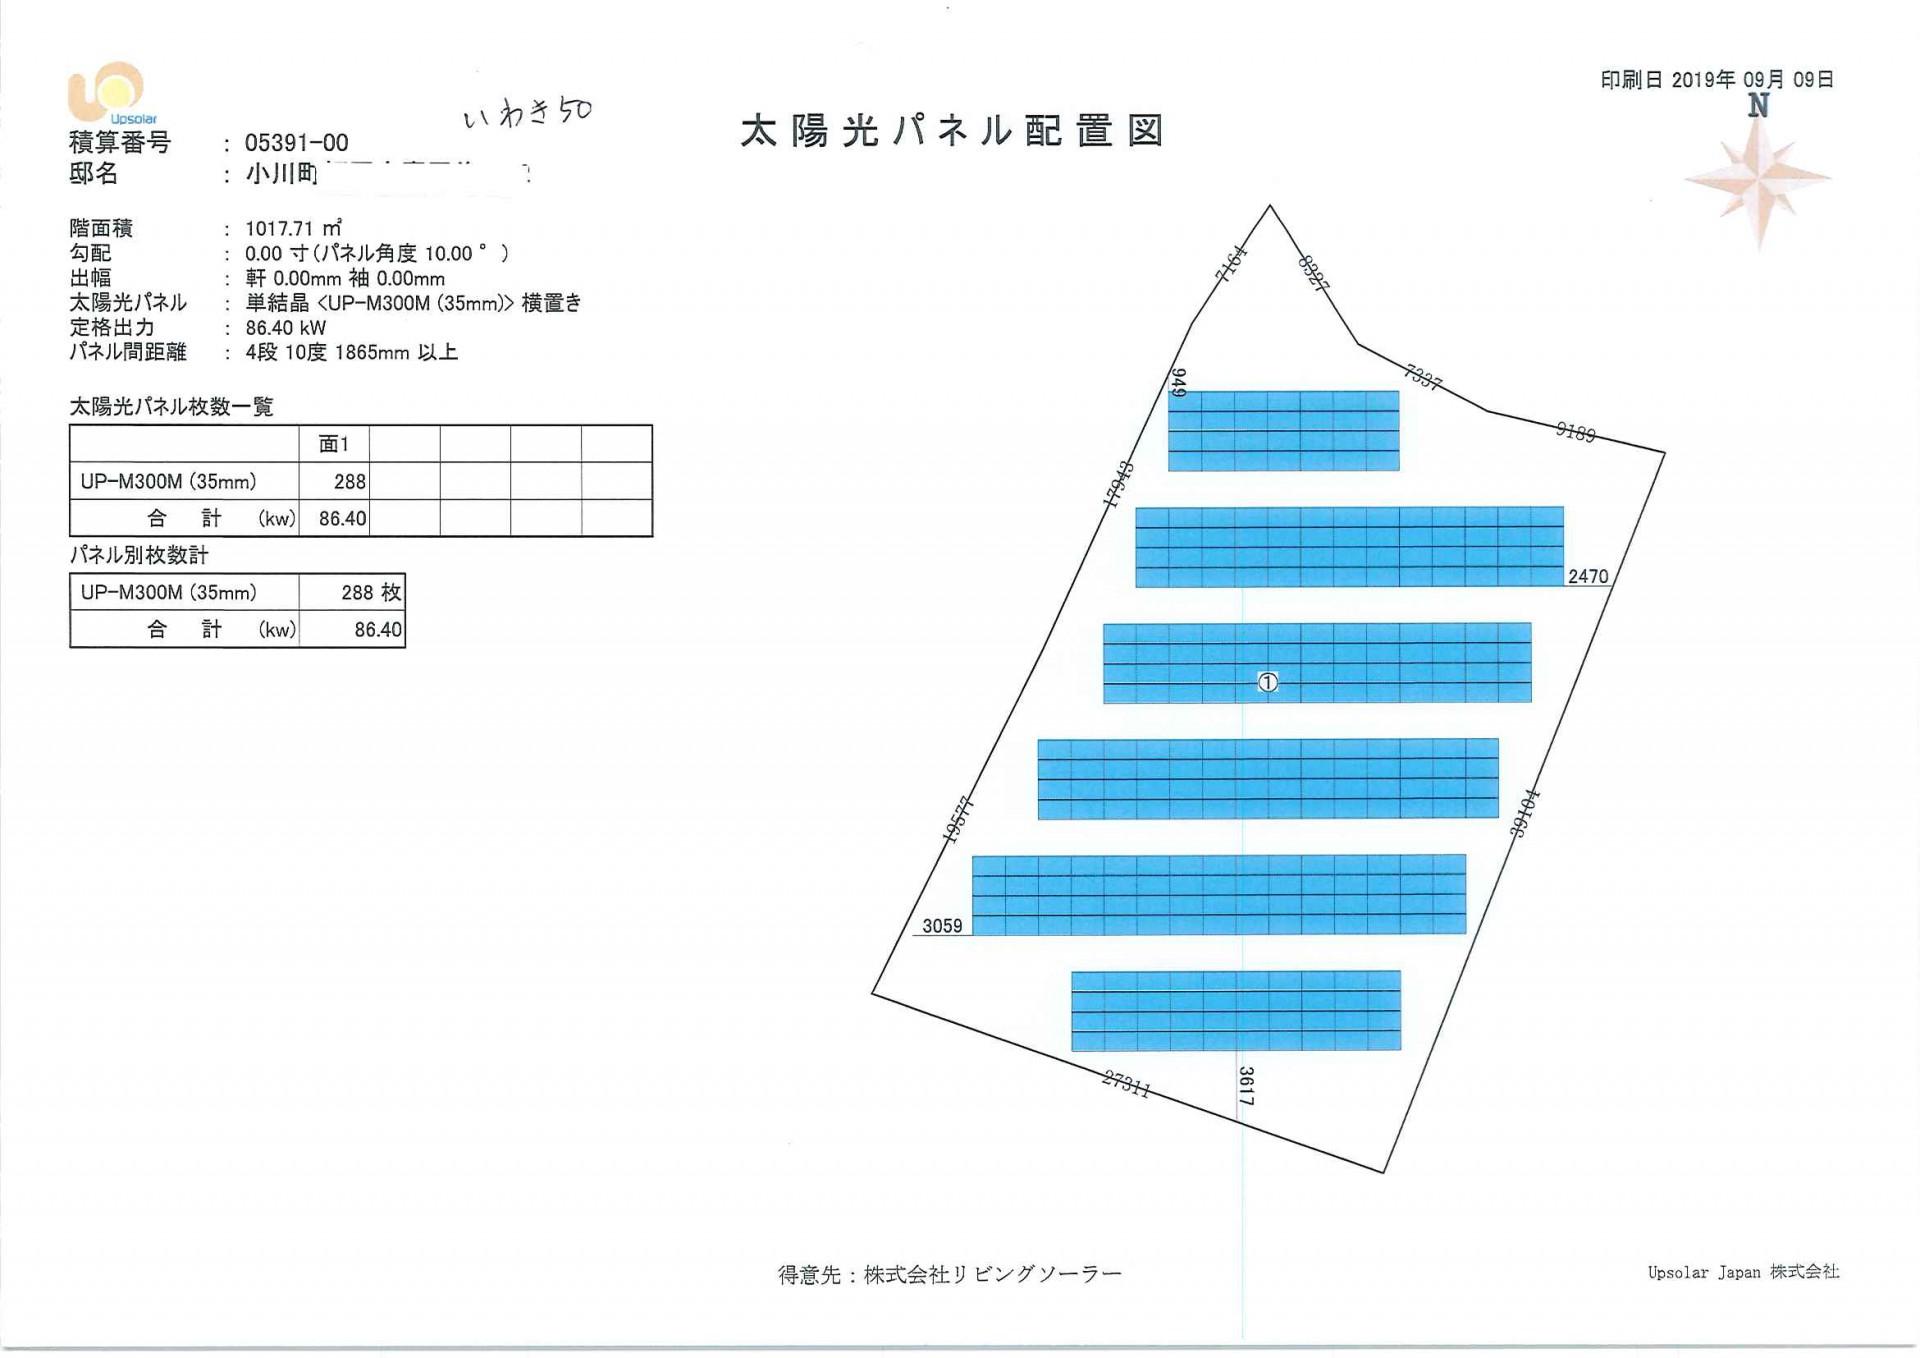 【LS】FIT14円 福島県いわき50発電所のメイン画像